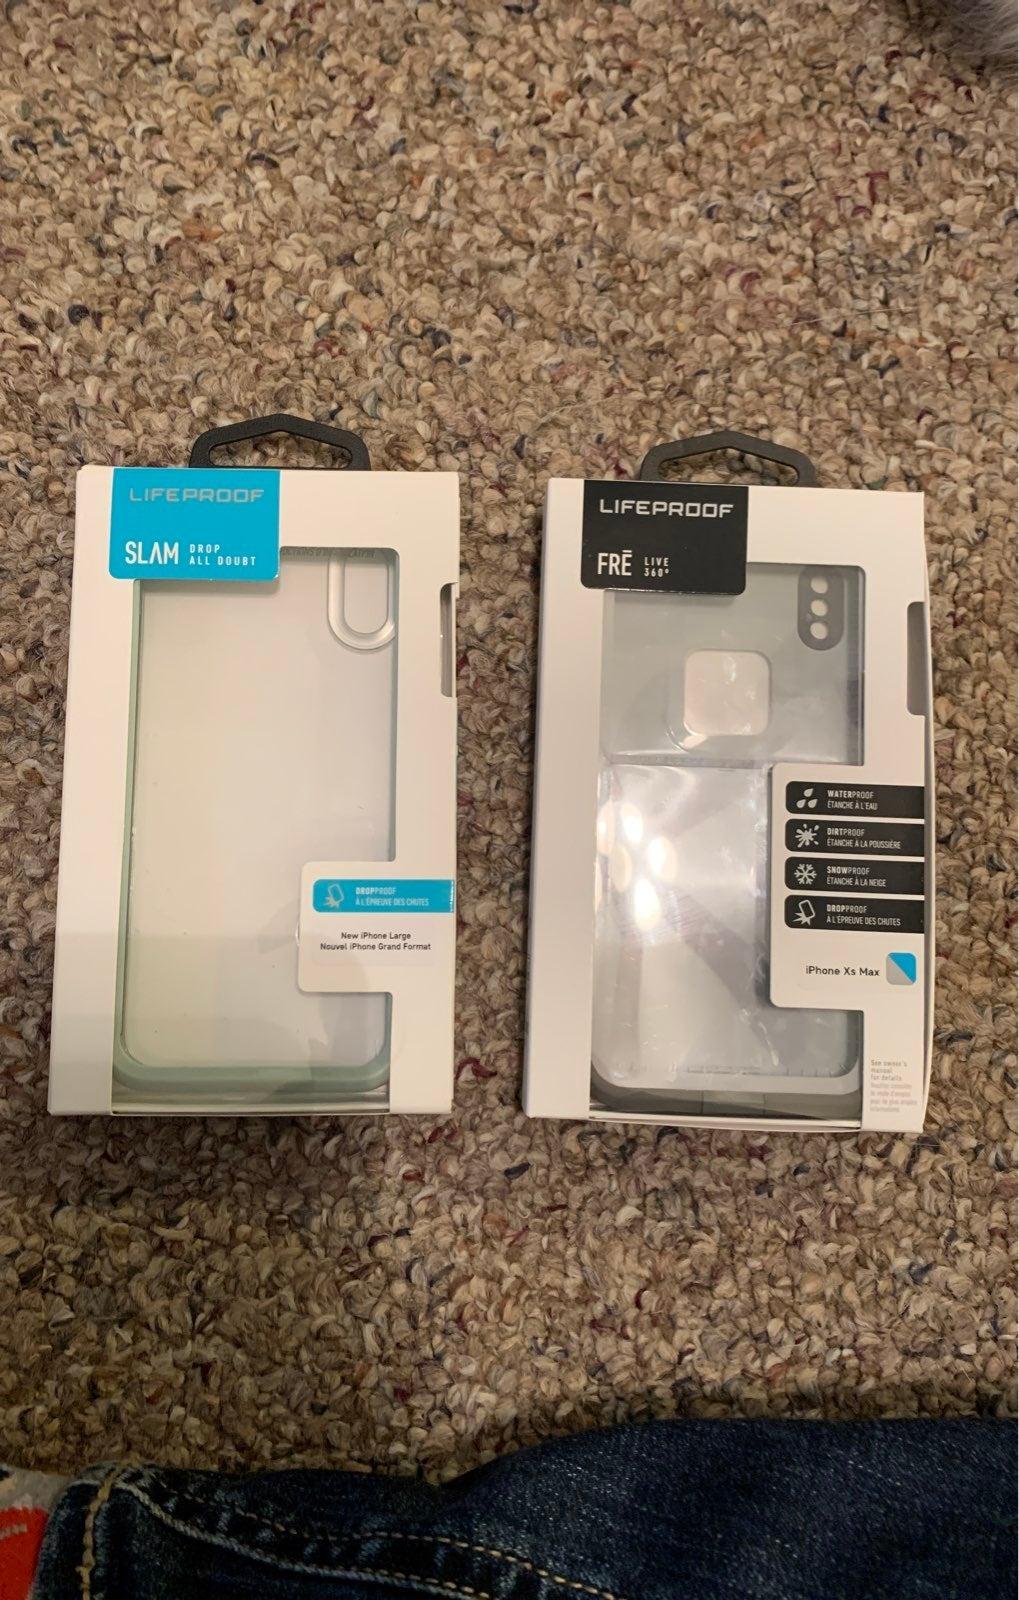 iPhone XS Max Lifeproof Cases